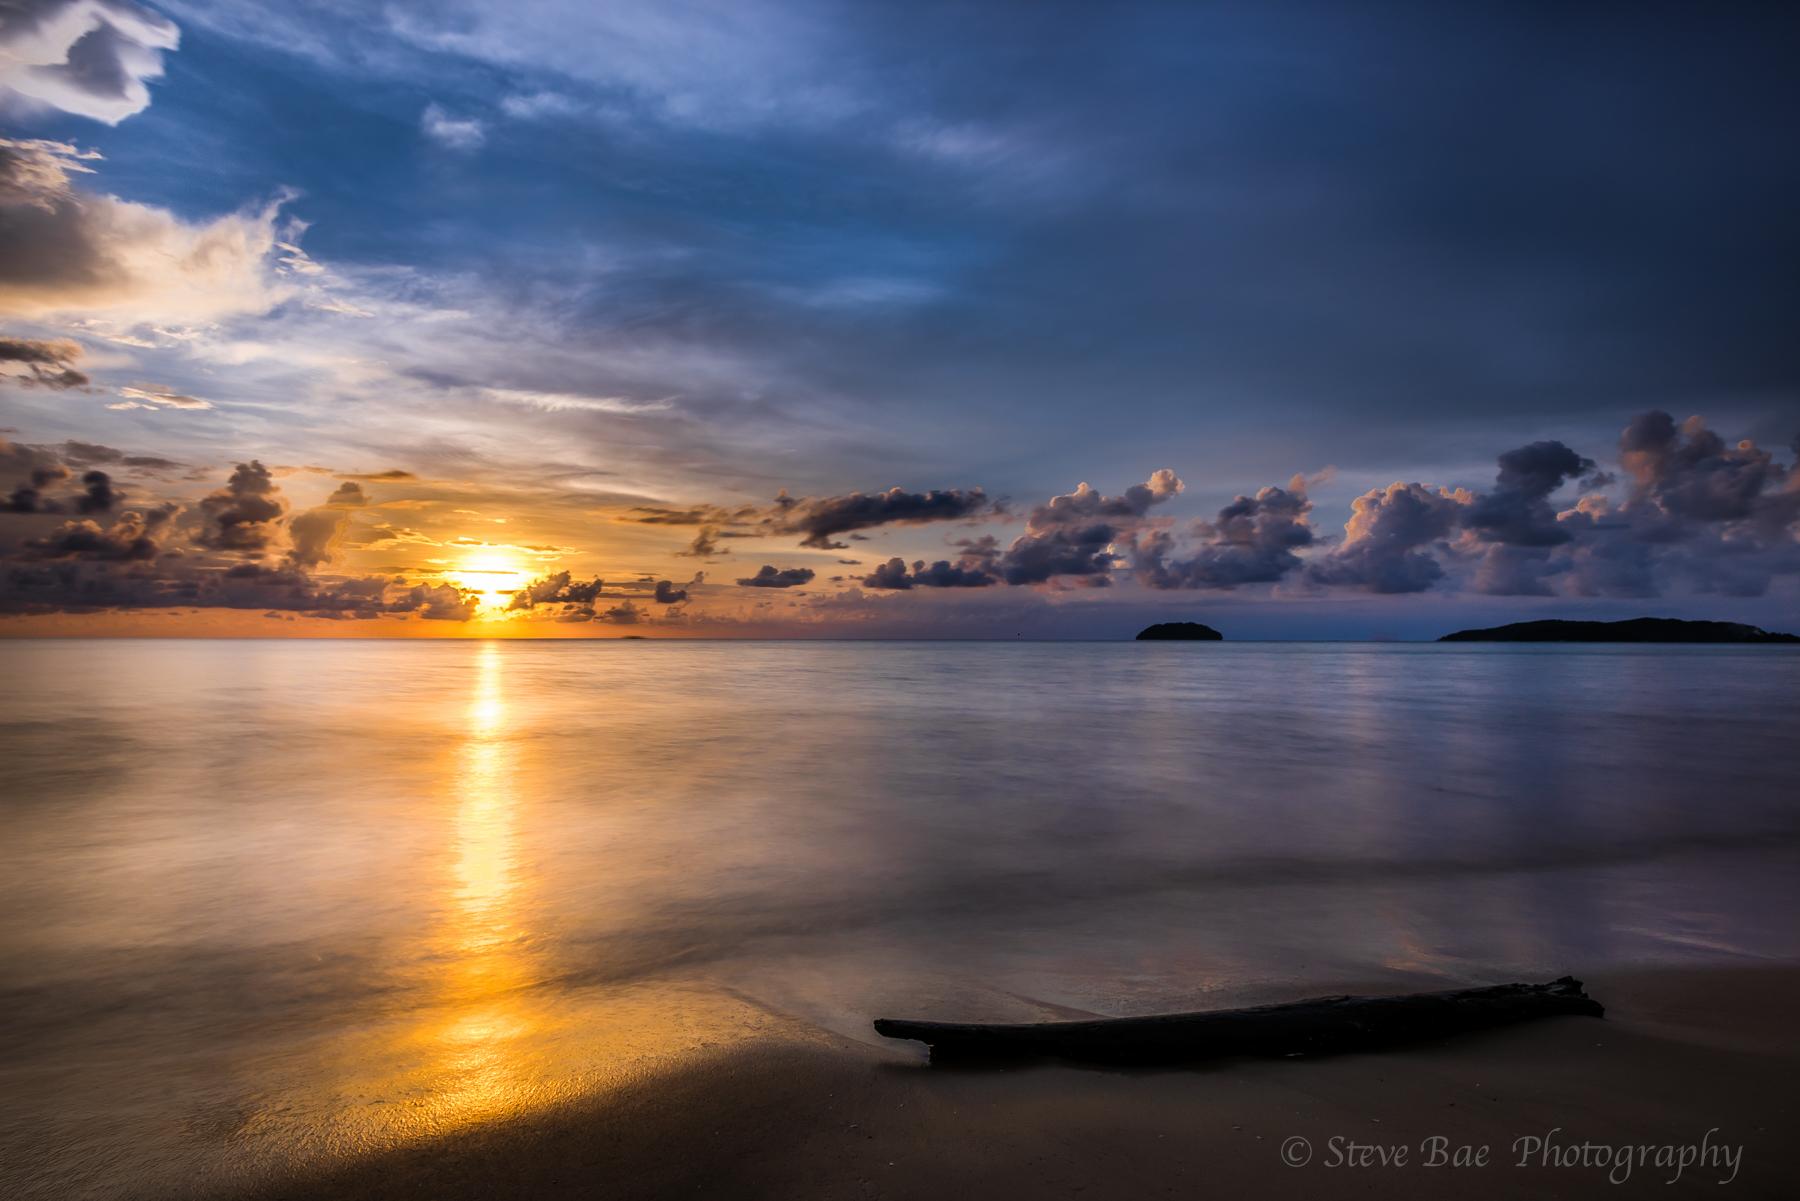 Sunset of Kota Kinabalu